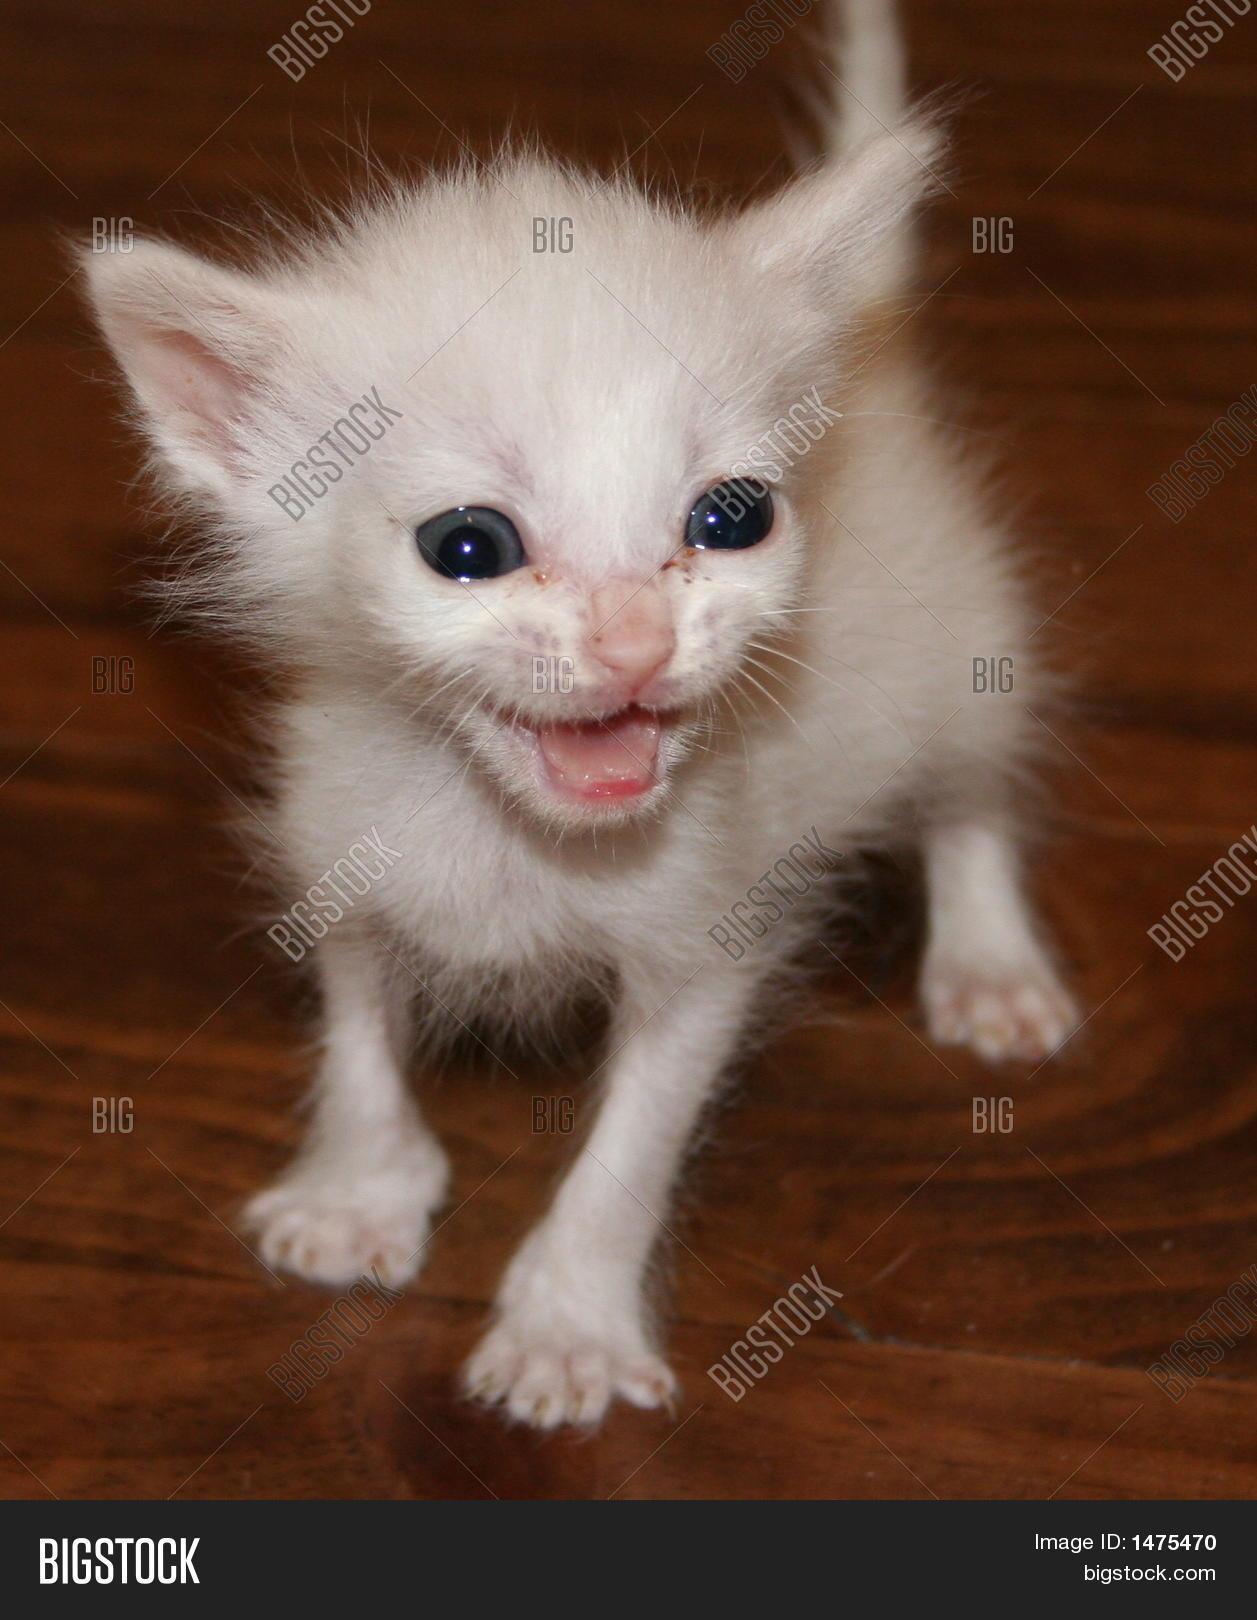 White Skinny Kitten Looking At Camera Stock Photo Stock